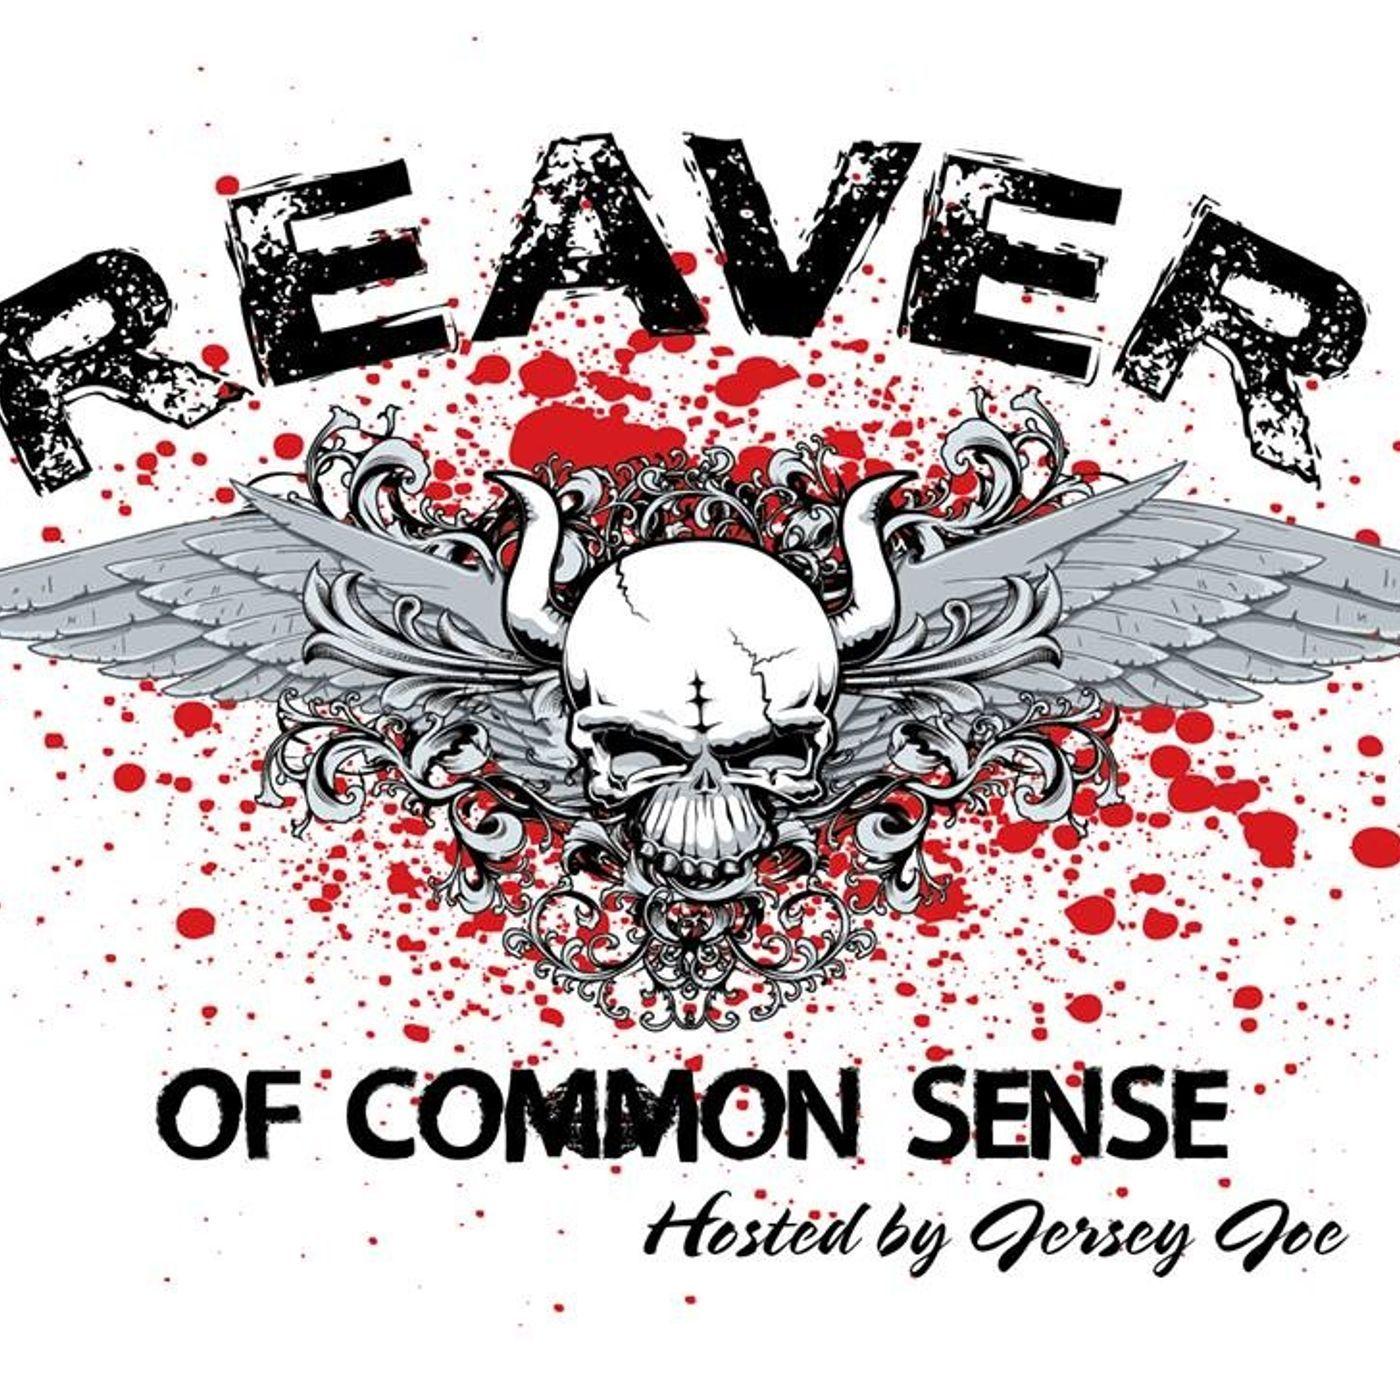 Reaver of Common Sense 03-04-2018